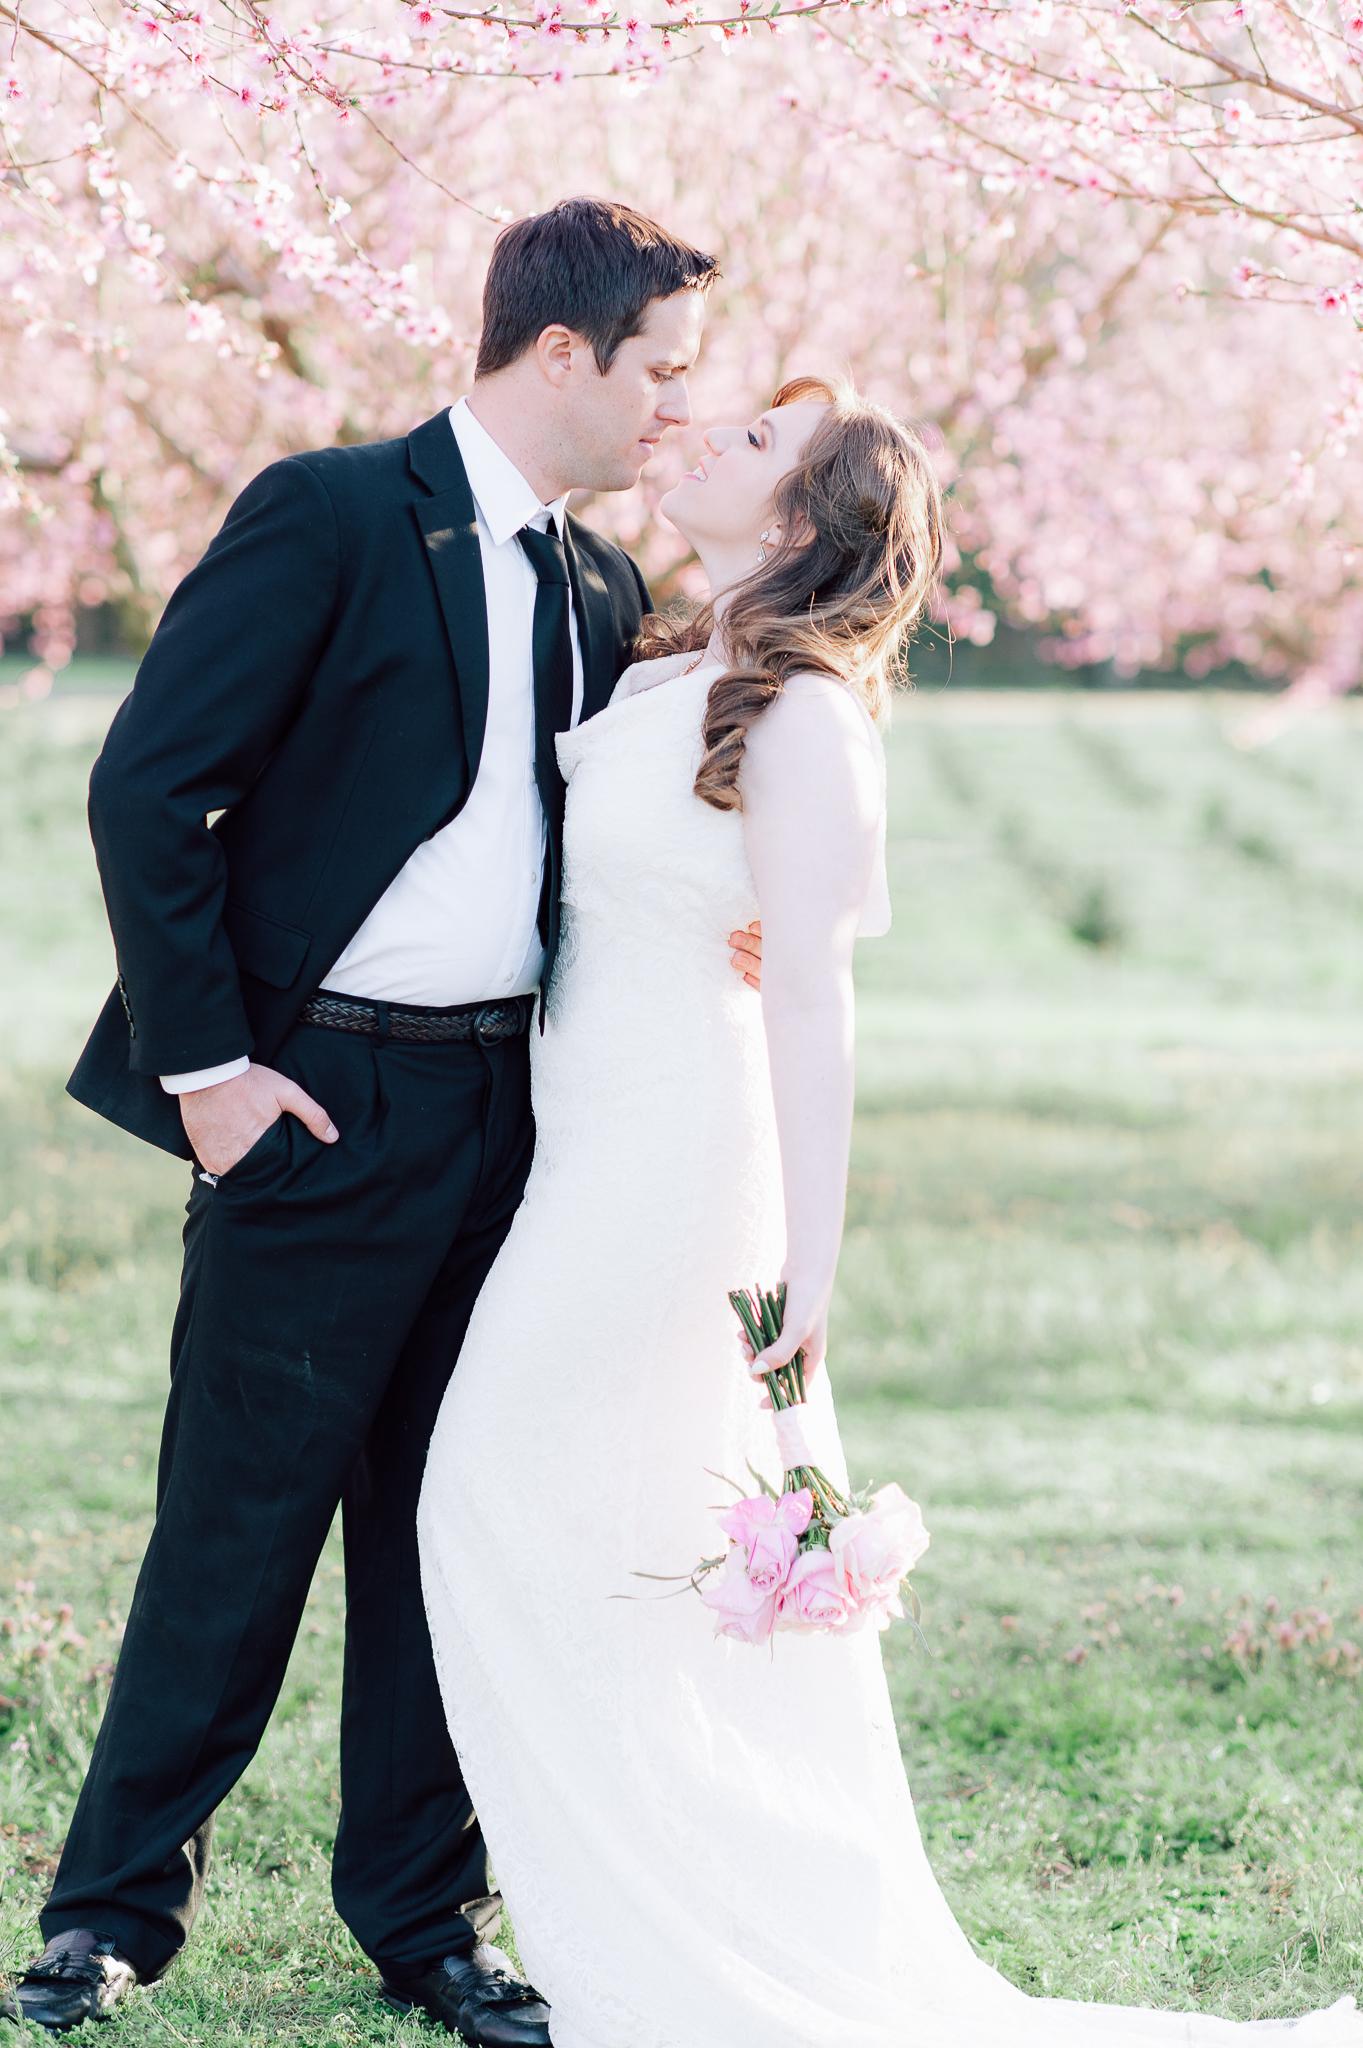 springwedding_cherryblossoms_virginiaphotographer_youseephotography_styledshoot (567).jpg